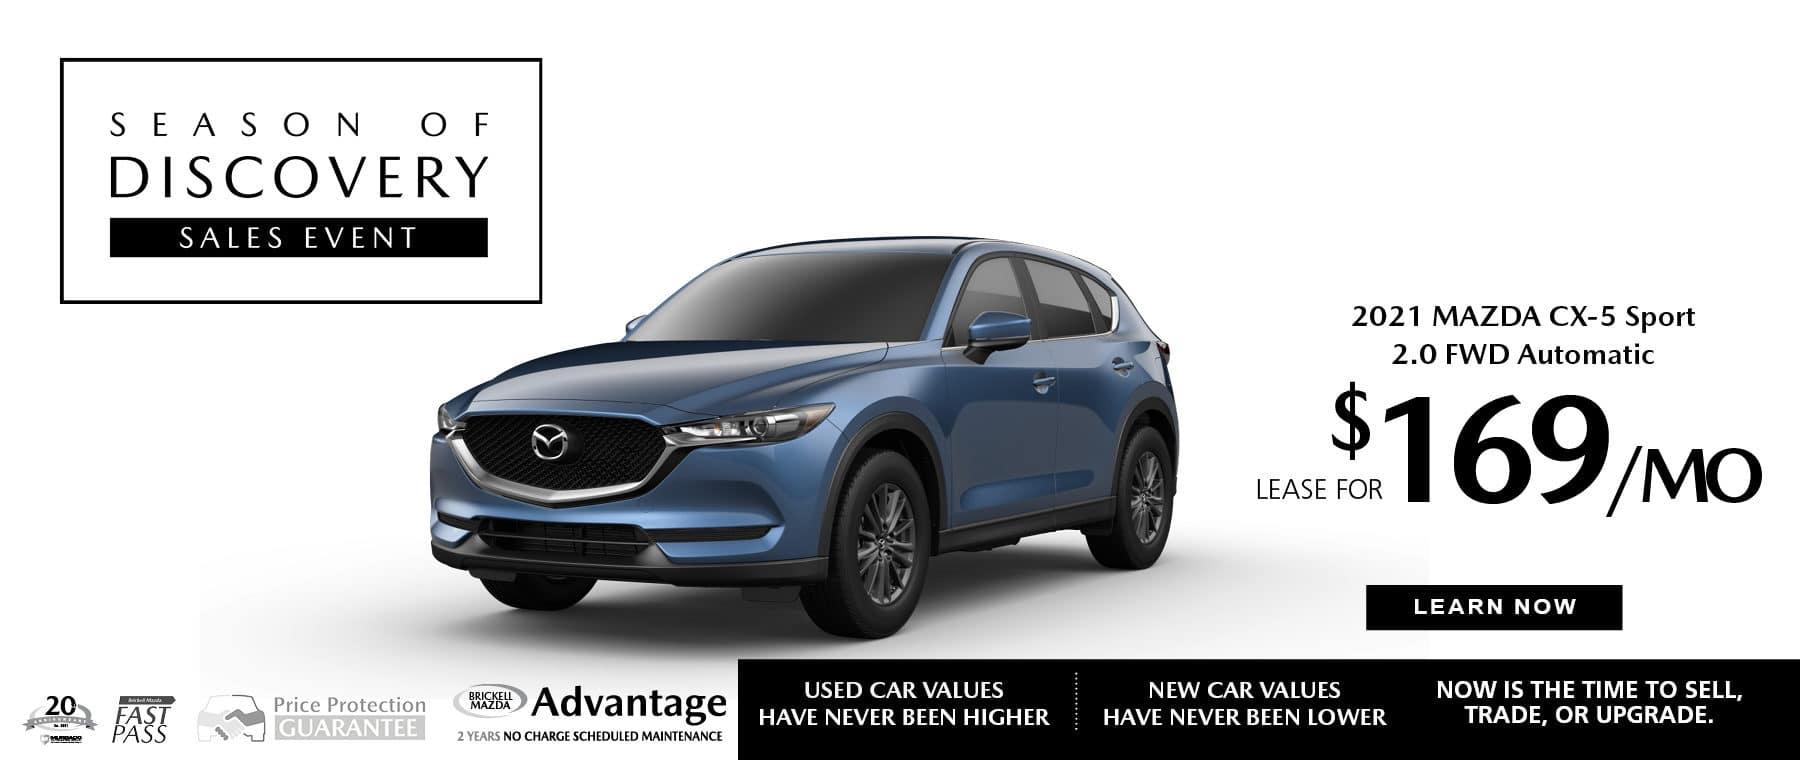 2021 Mazda CX-5 $169 a MonthBlue Vehicle